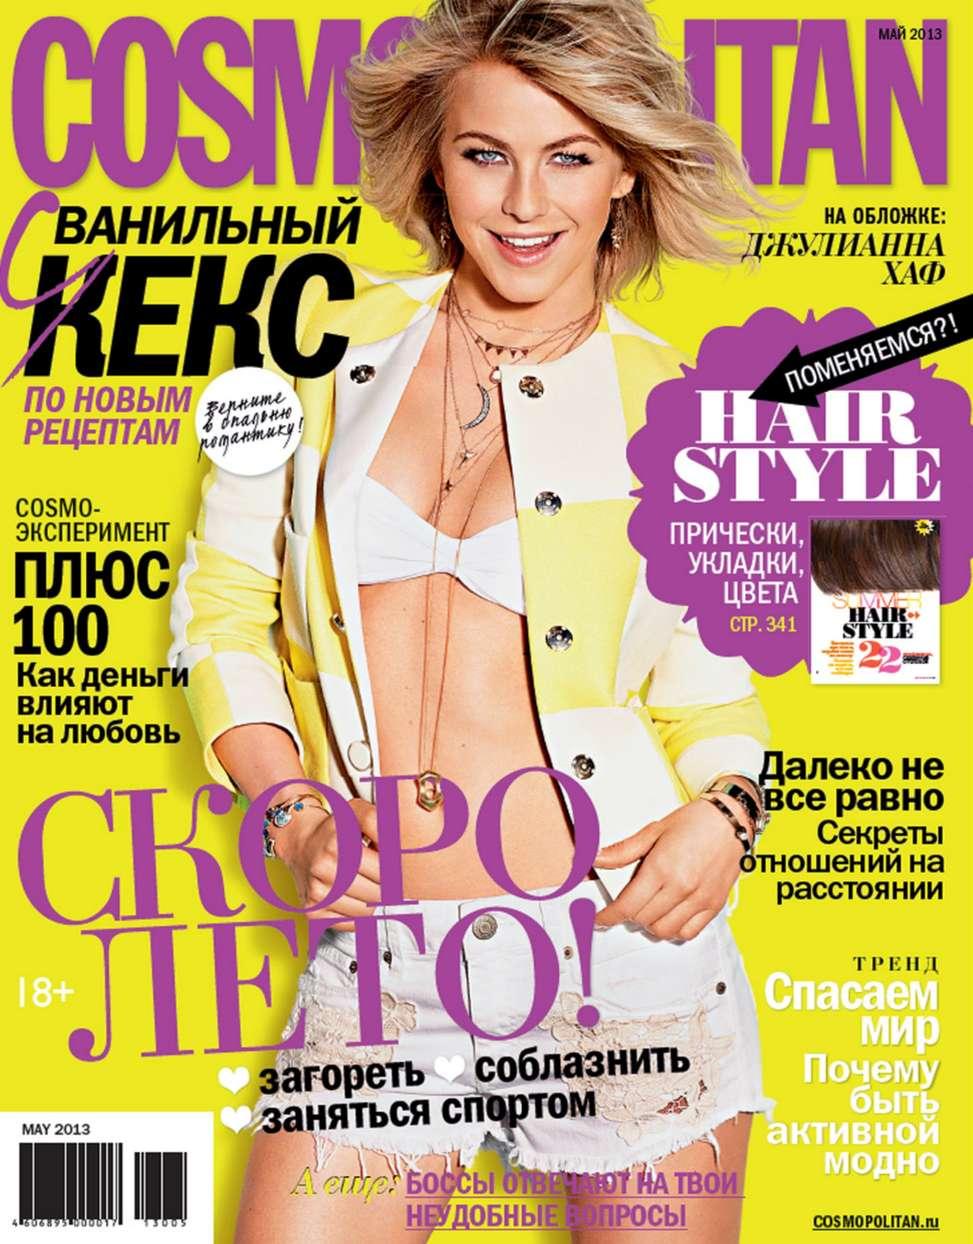 Редакция журнала Cosmopolitan Cosmopolitan 05-2013 cannondale supersix women's 5 105 2013